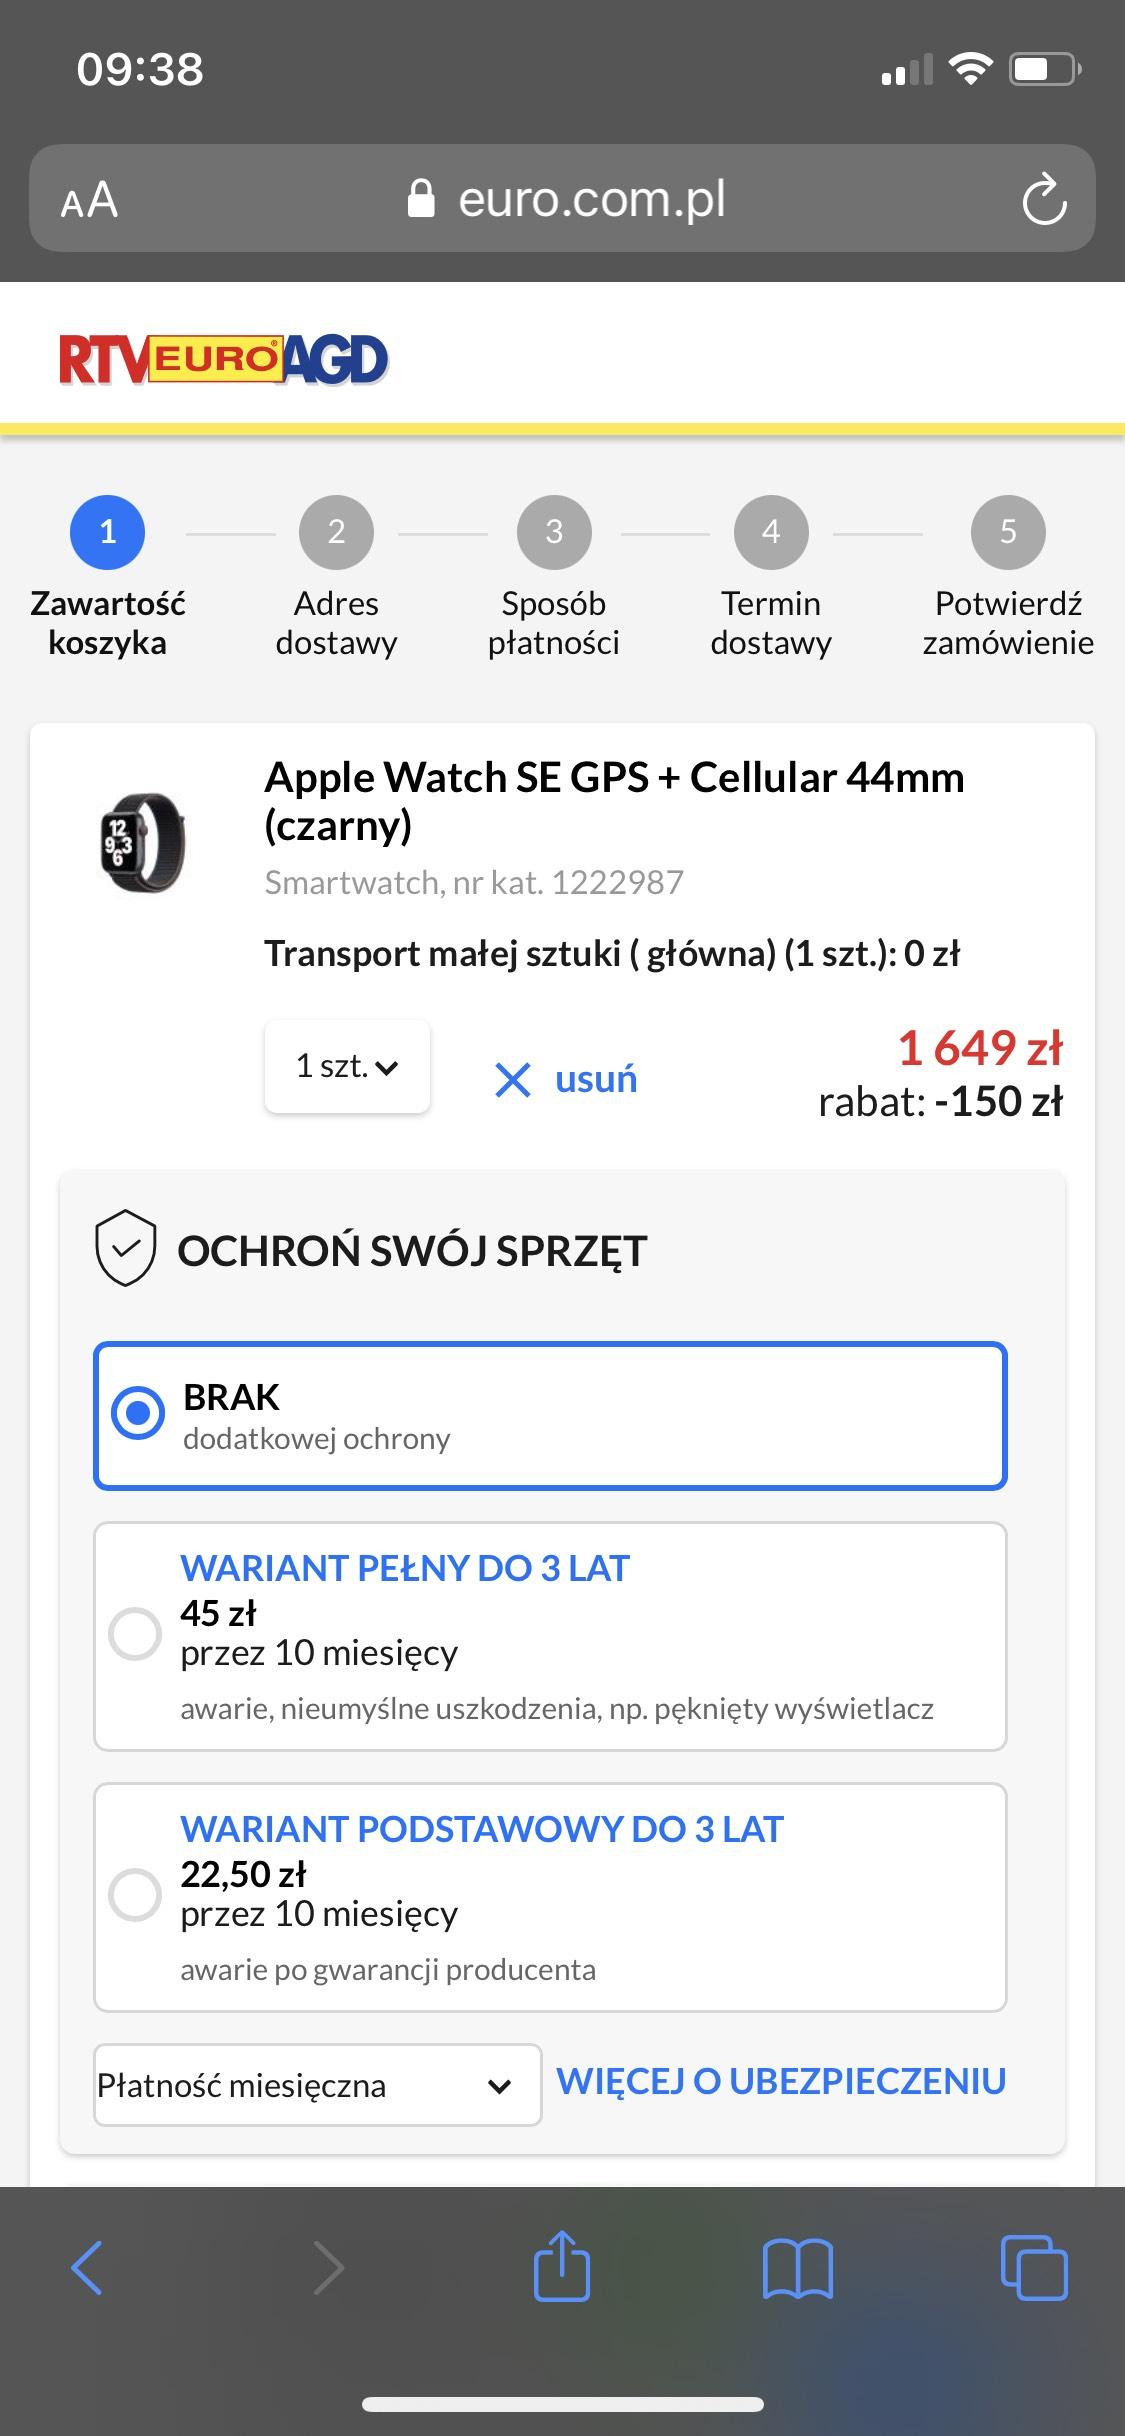 Apple Watch SE GPS + Cellular 44mm (czarny)